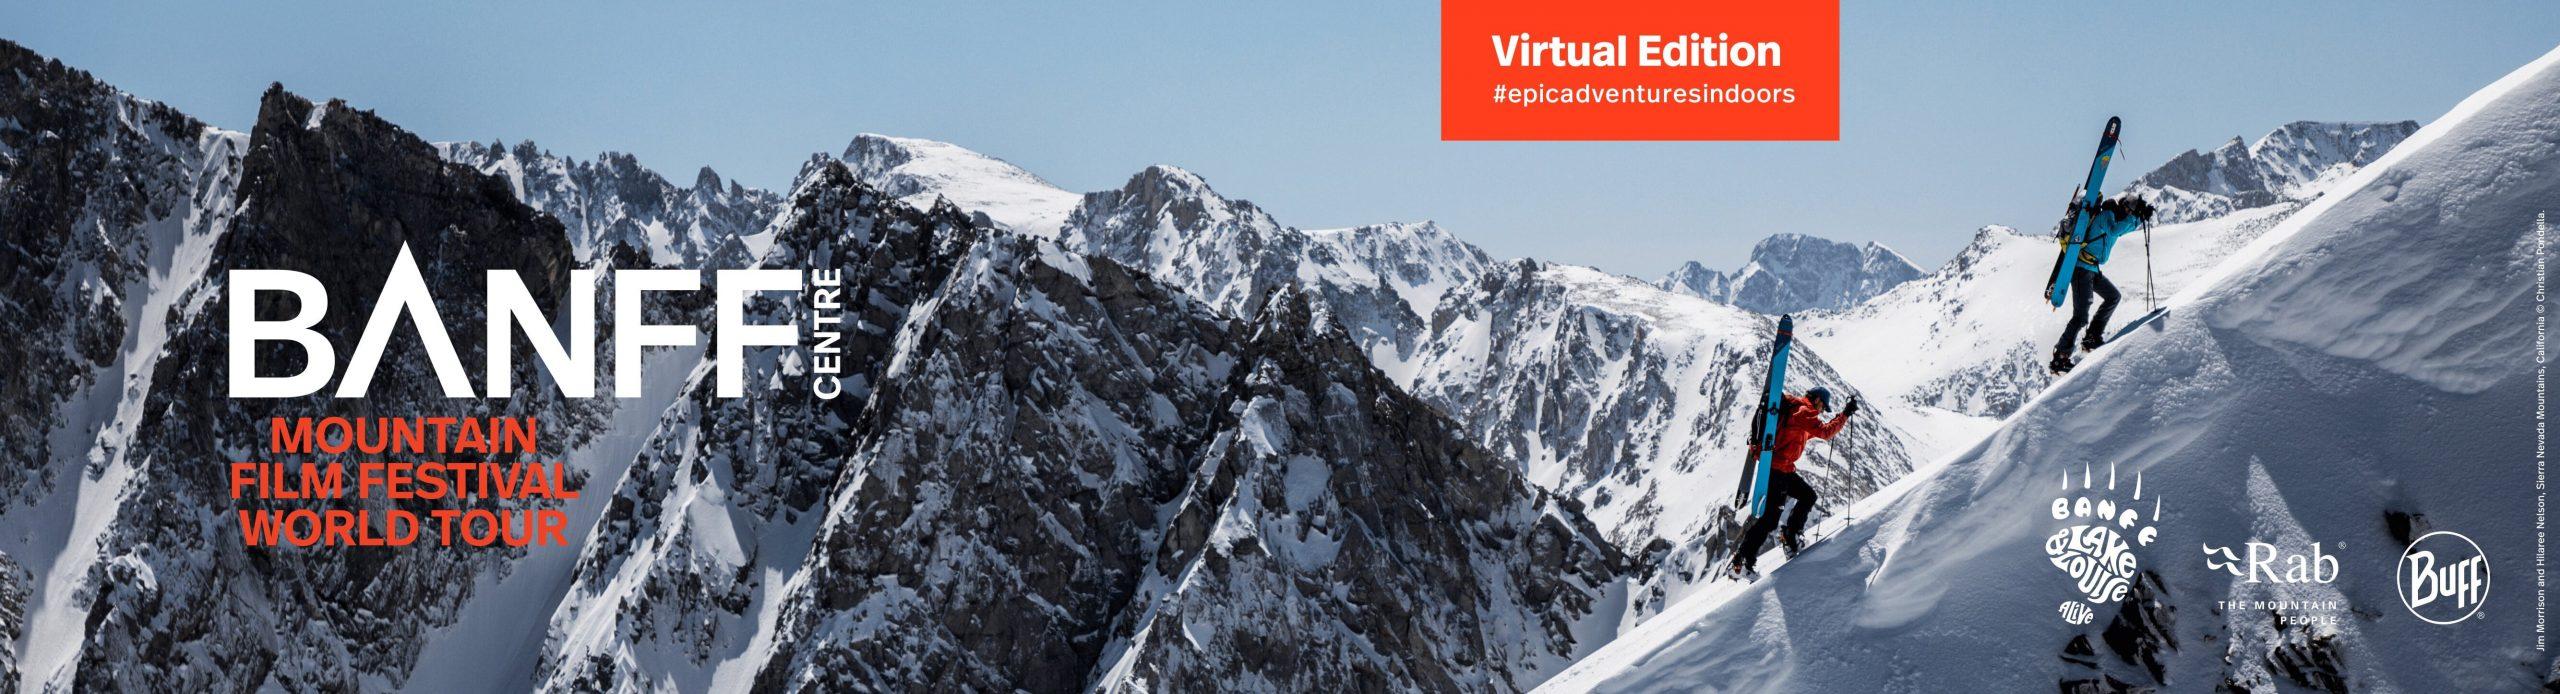 Banff Mountain Film Festival Virtual Tour